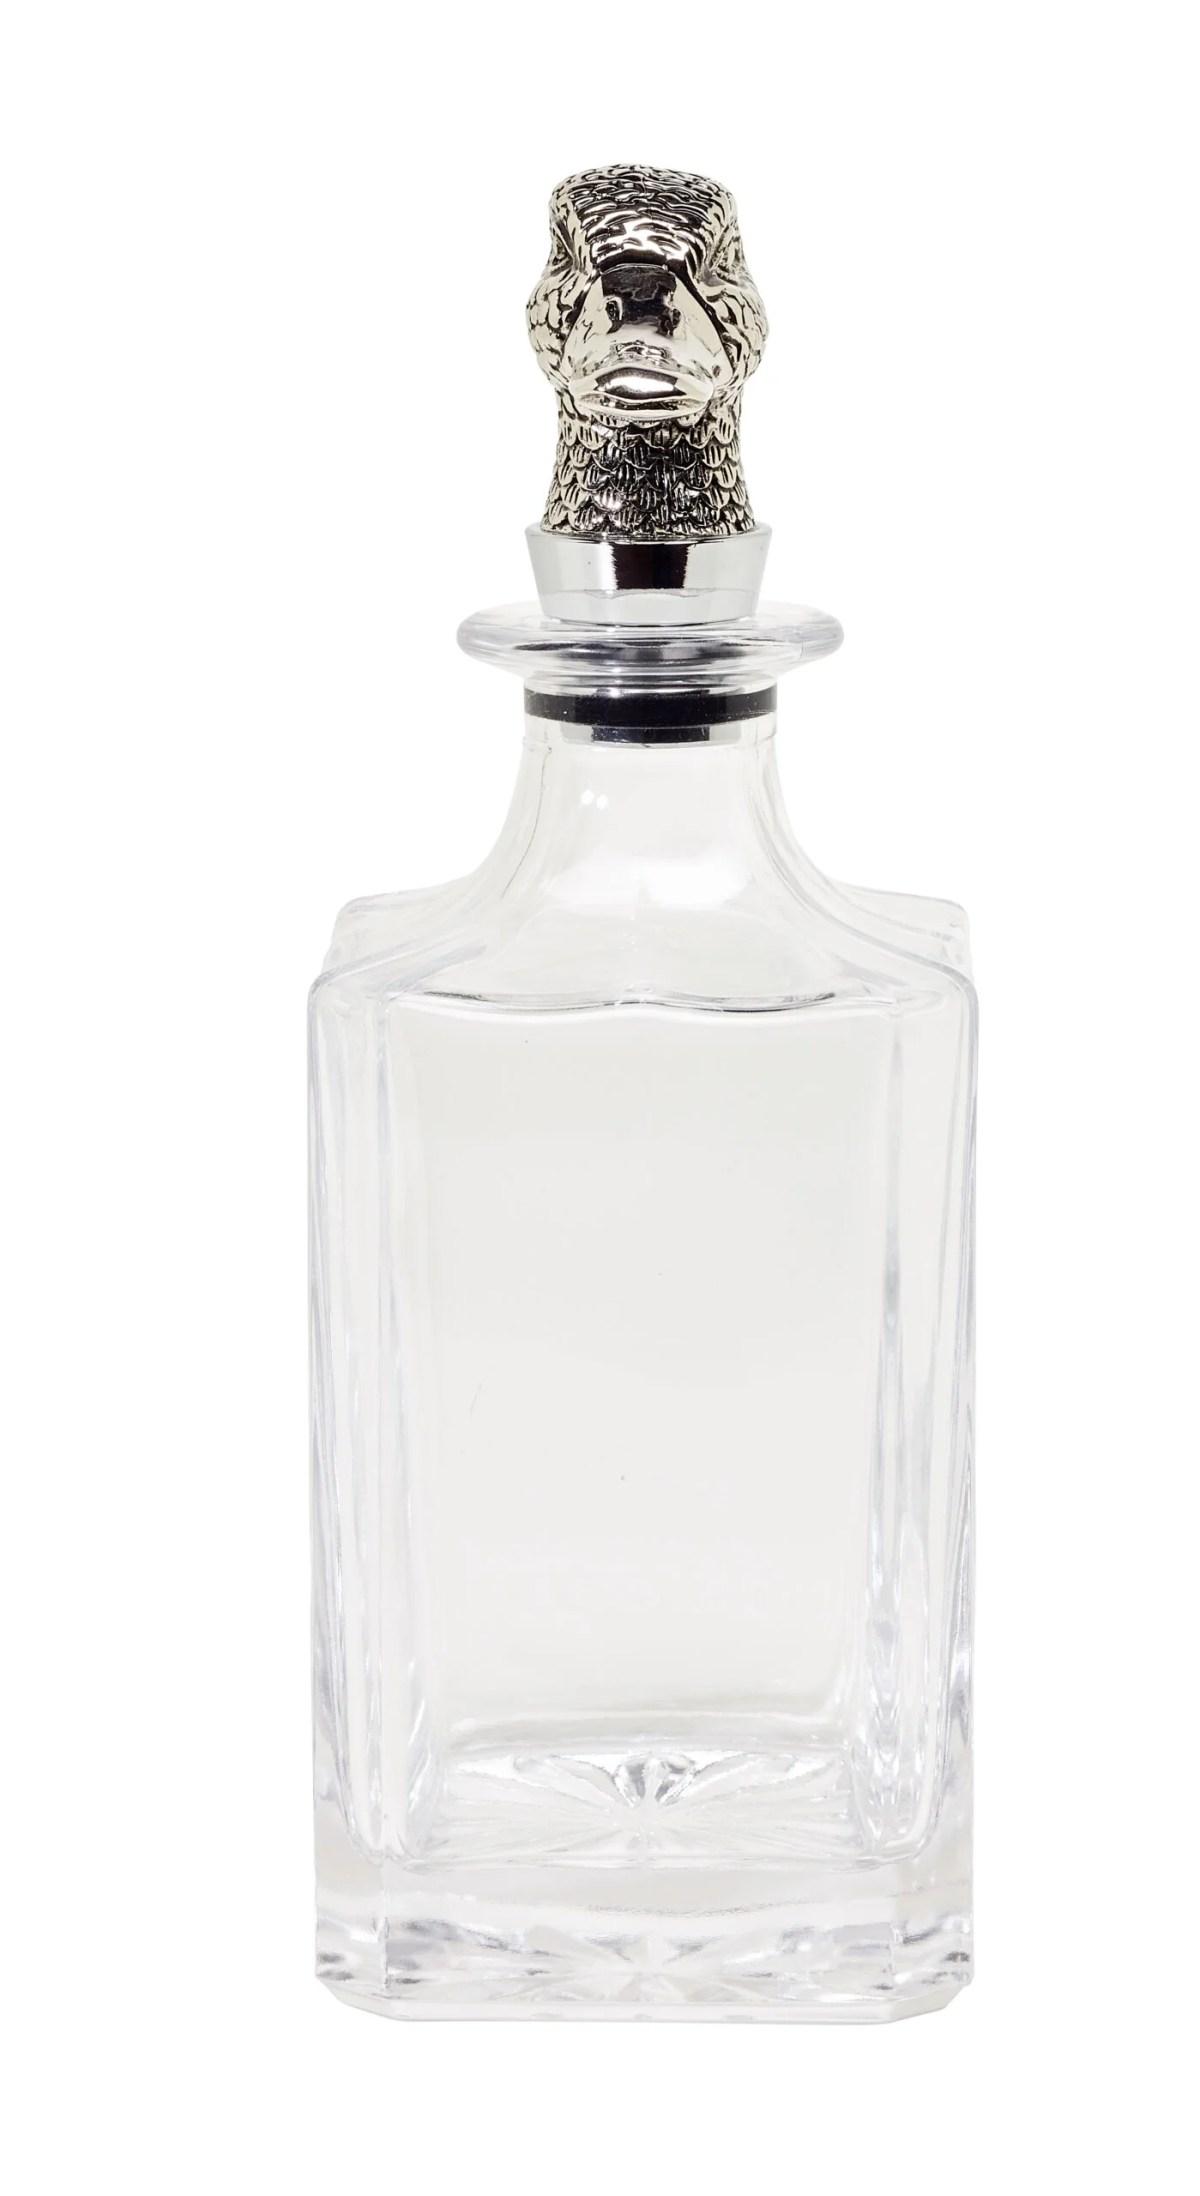 2170 Glas Karaffe Ente H 26cm